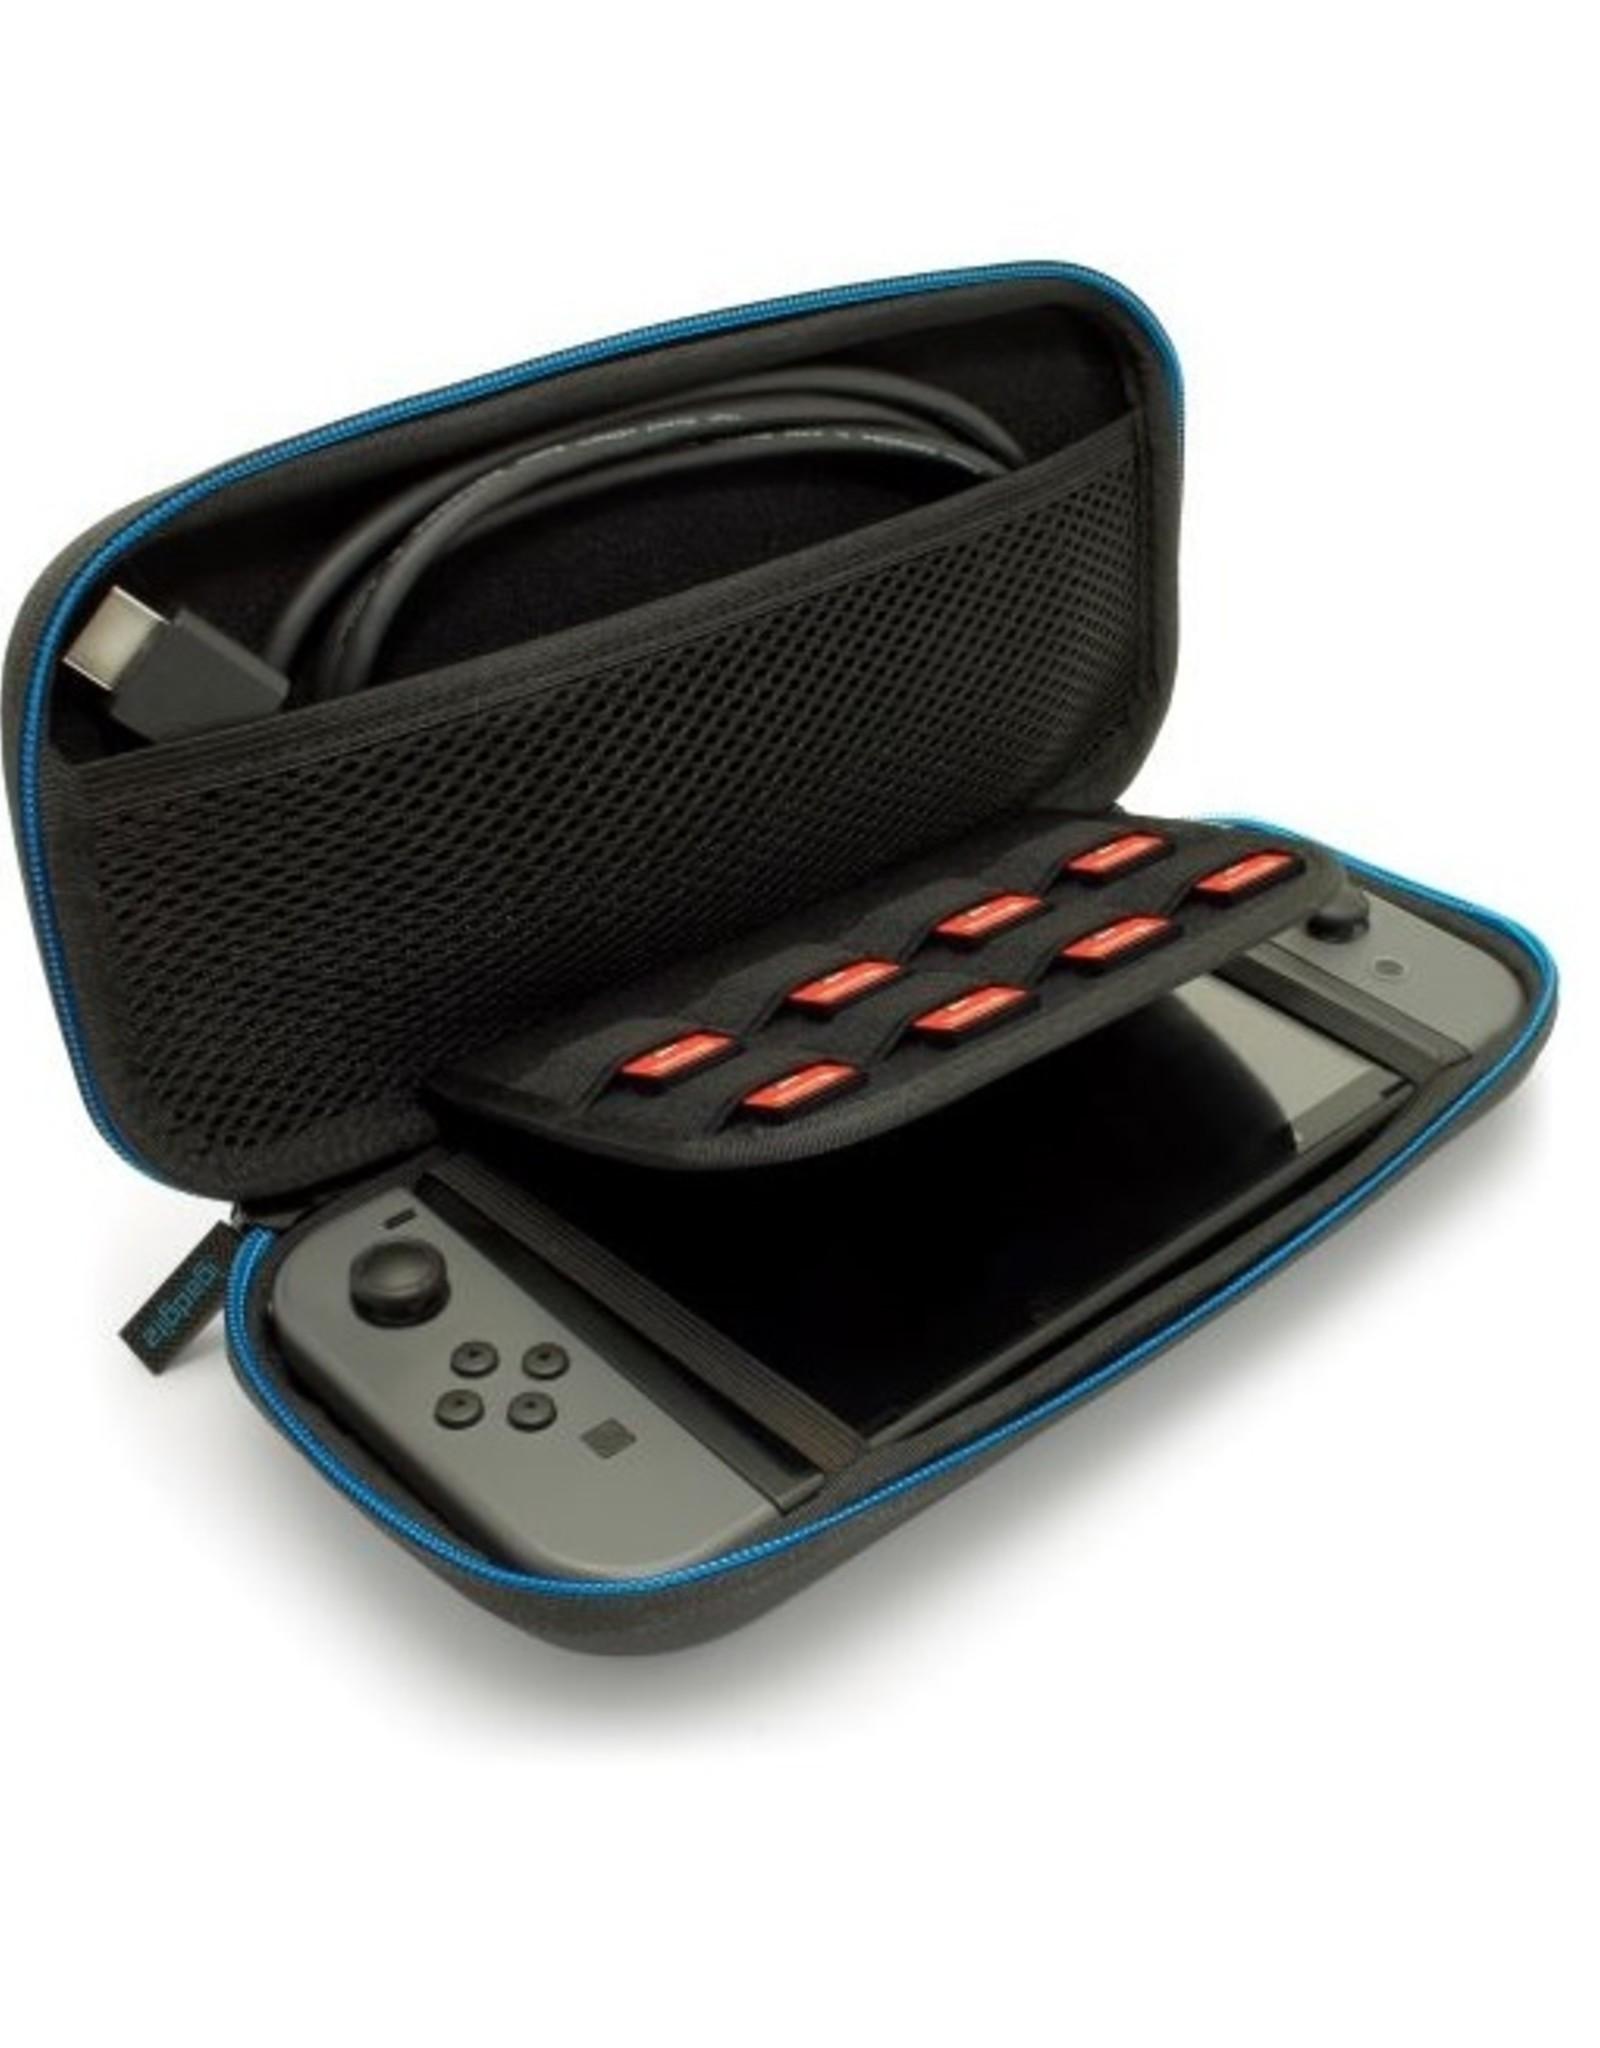 Nintendo Nintendo Switch Travel Carrying Thin amCase Black